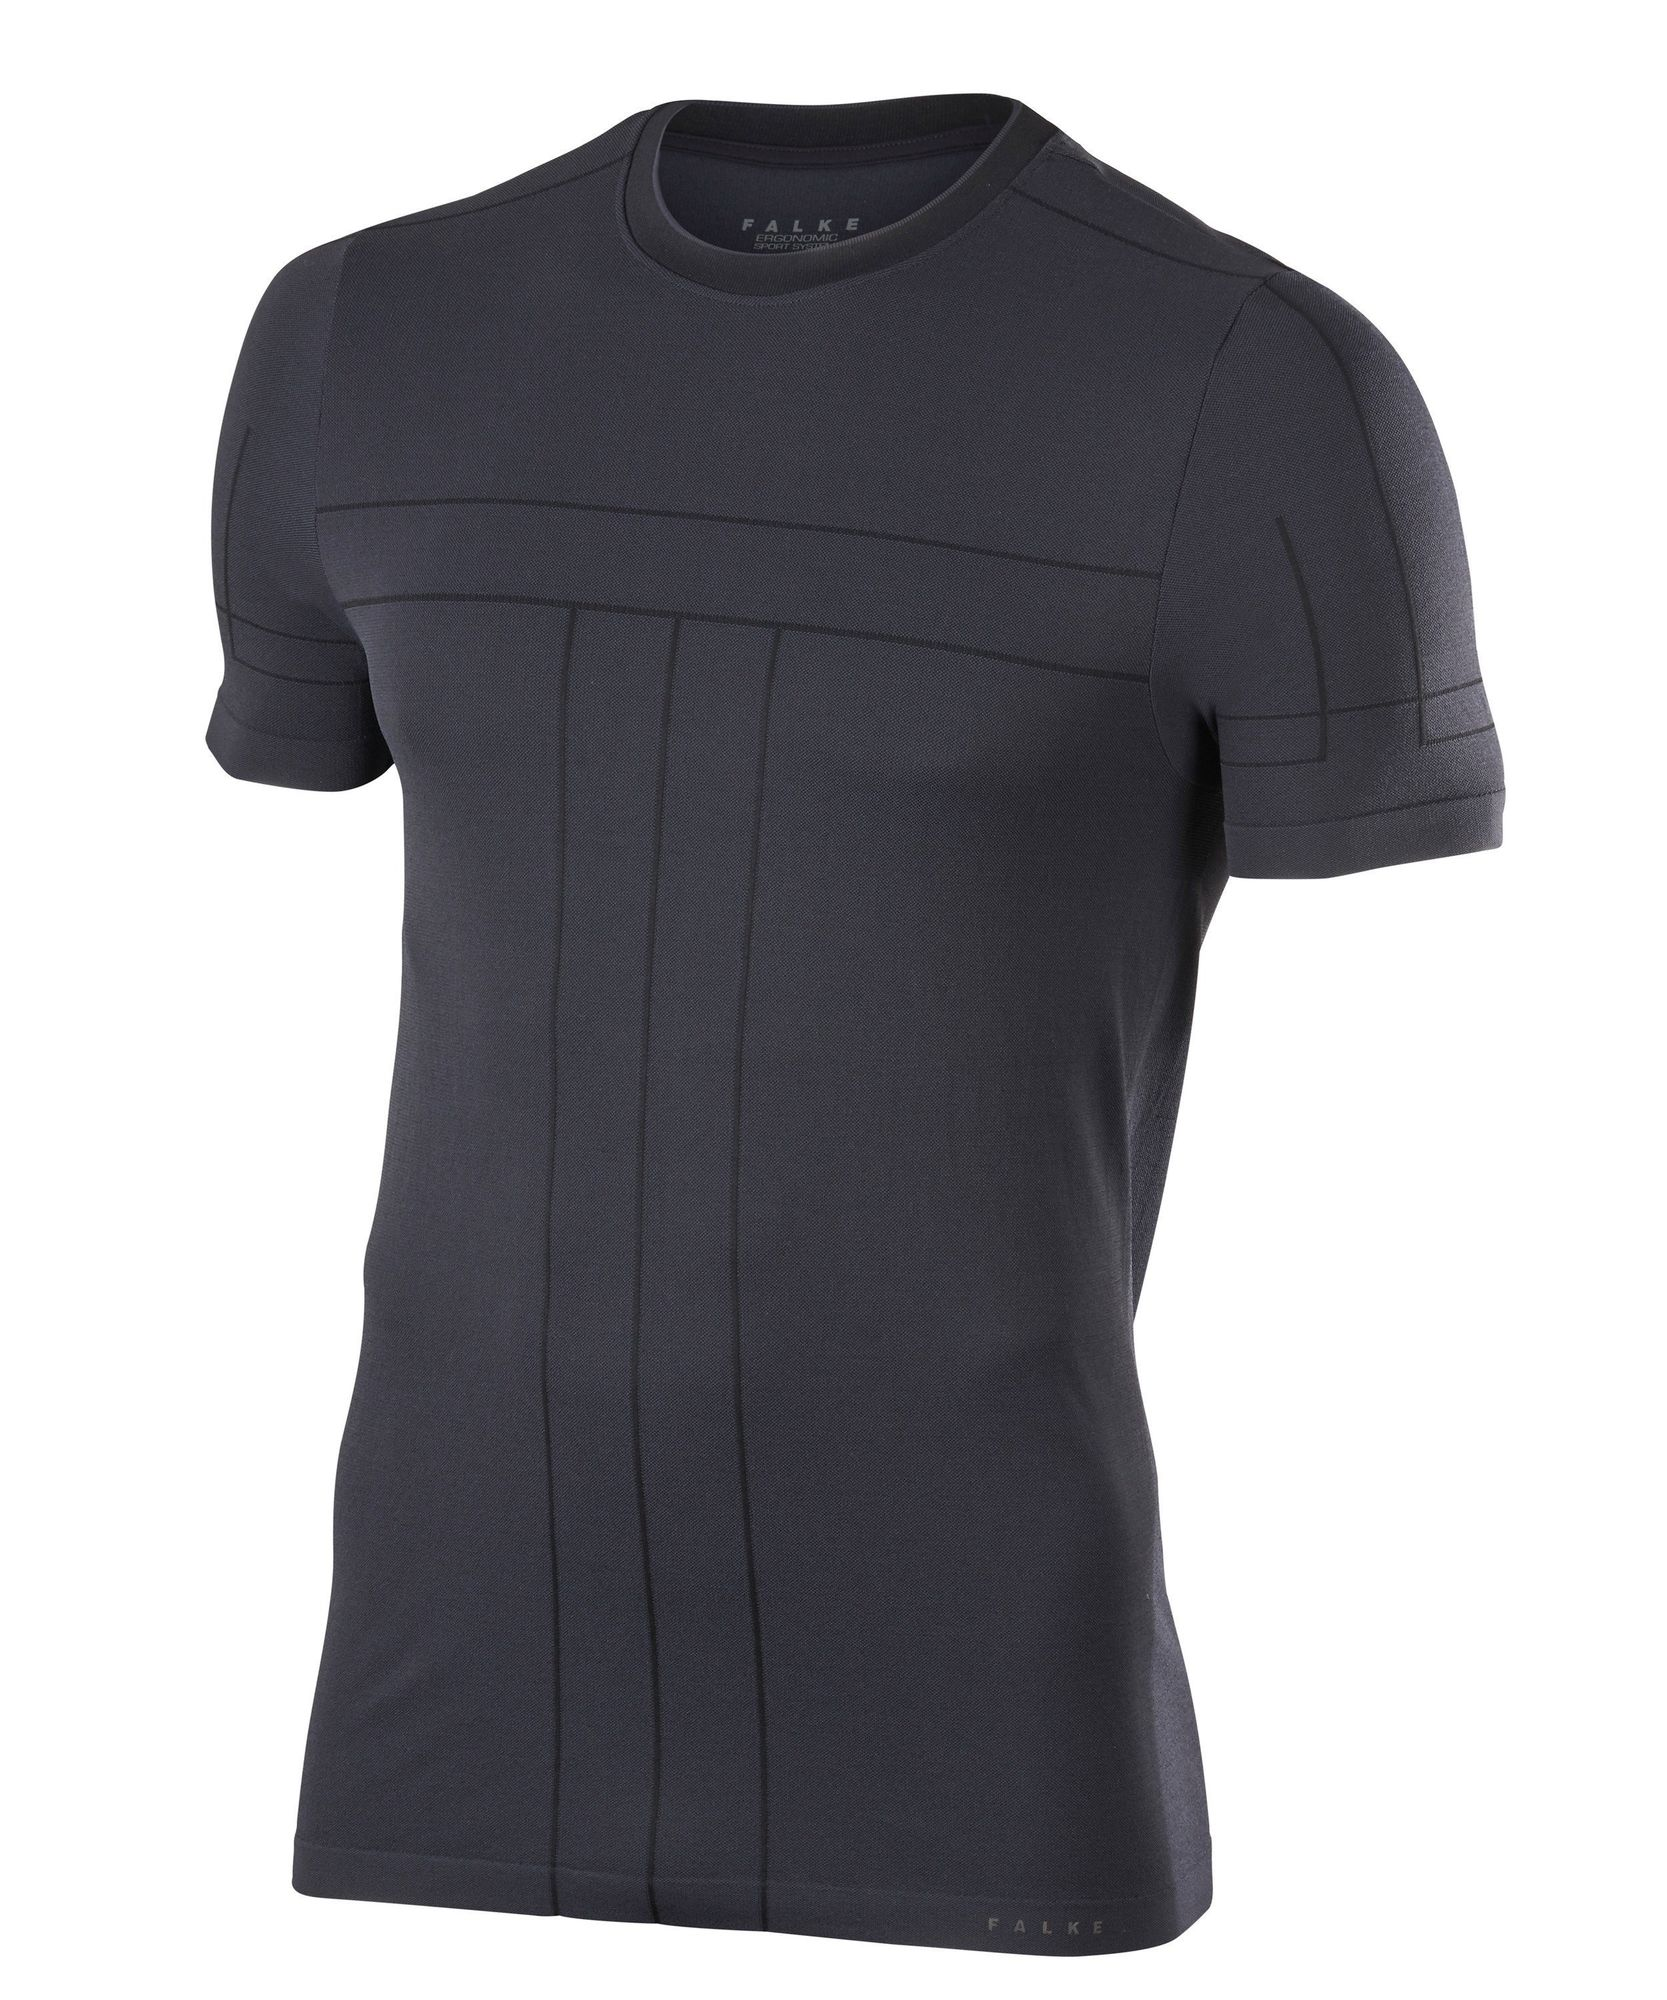 Falke Basic T-Shirt in Schwarz